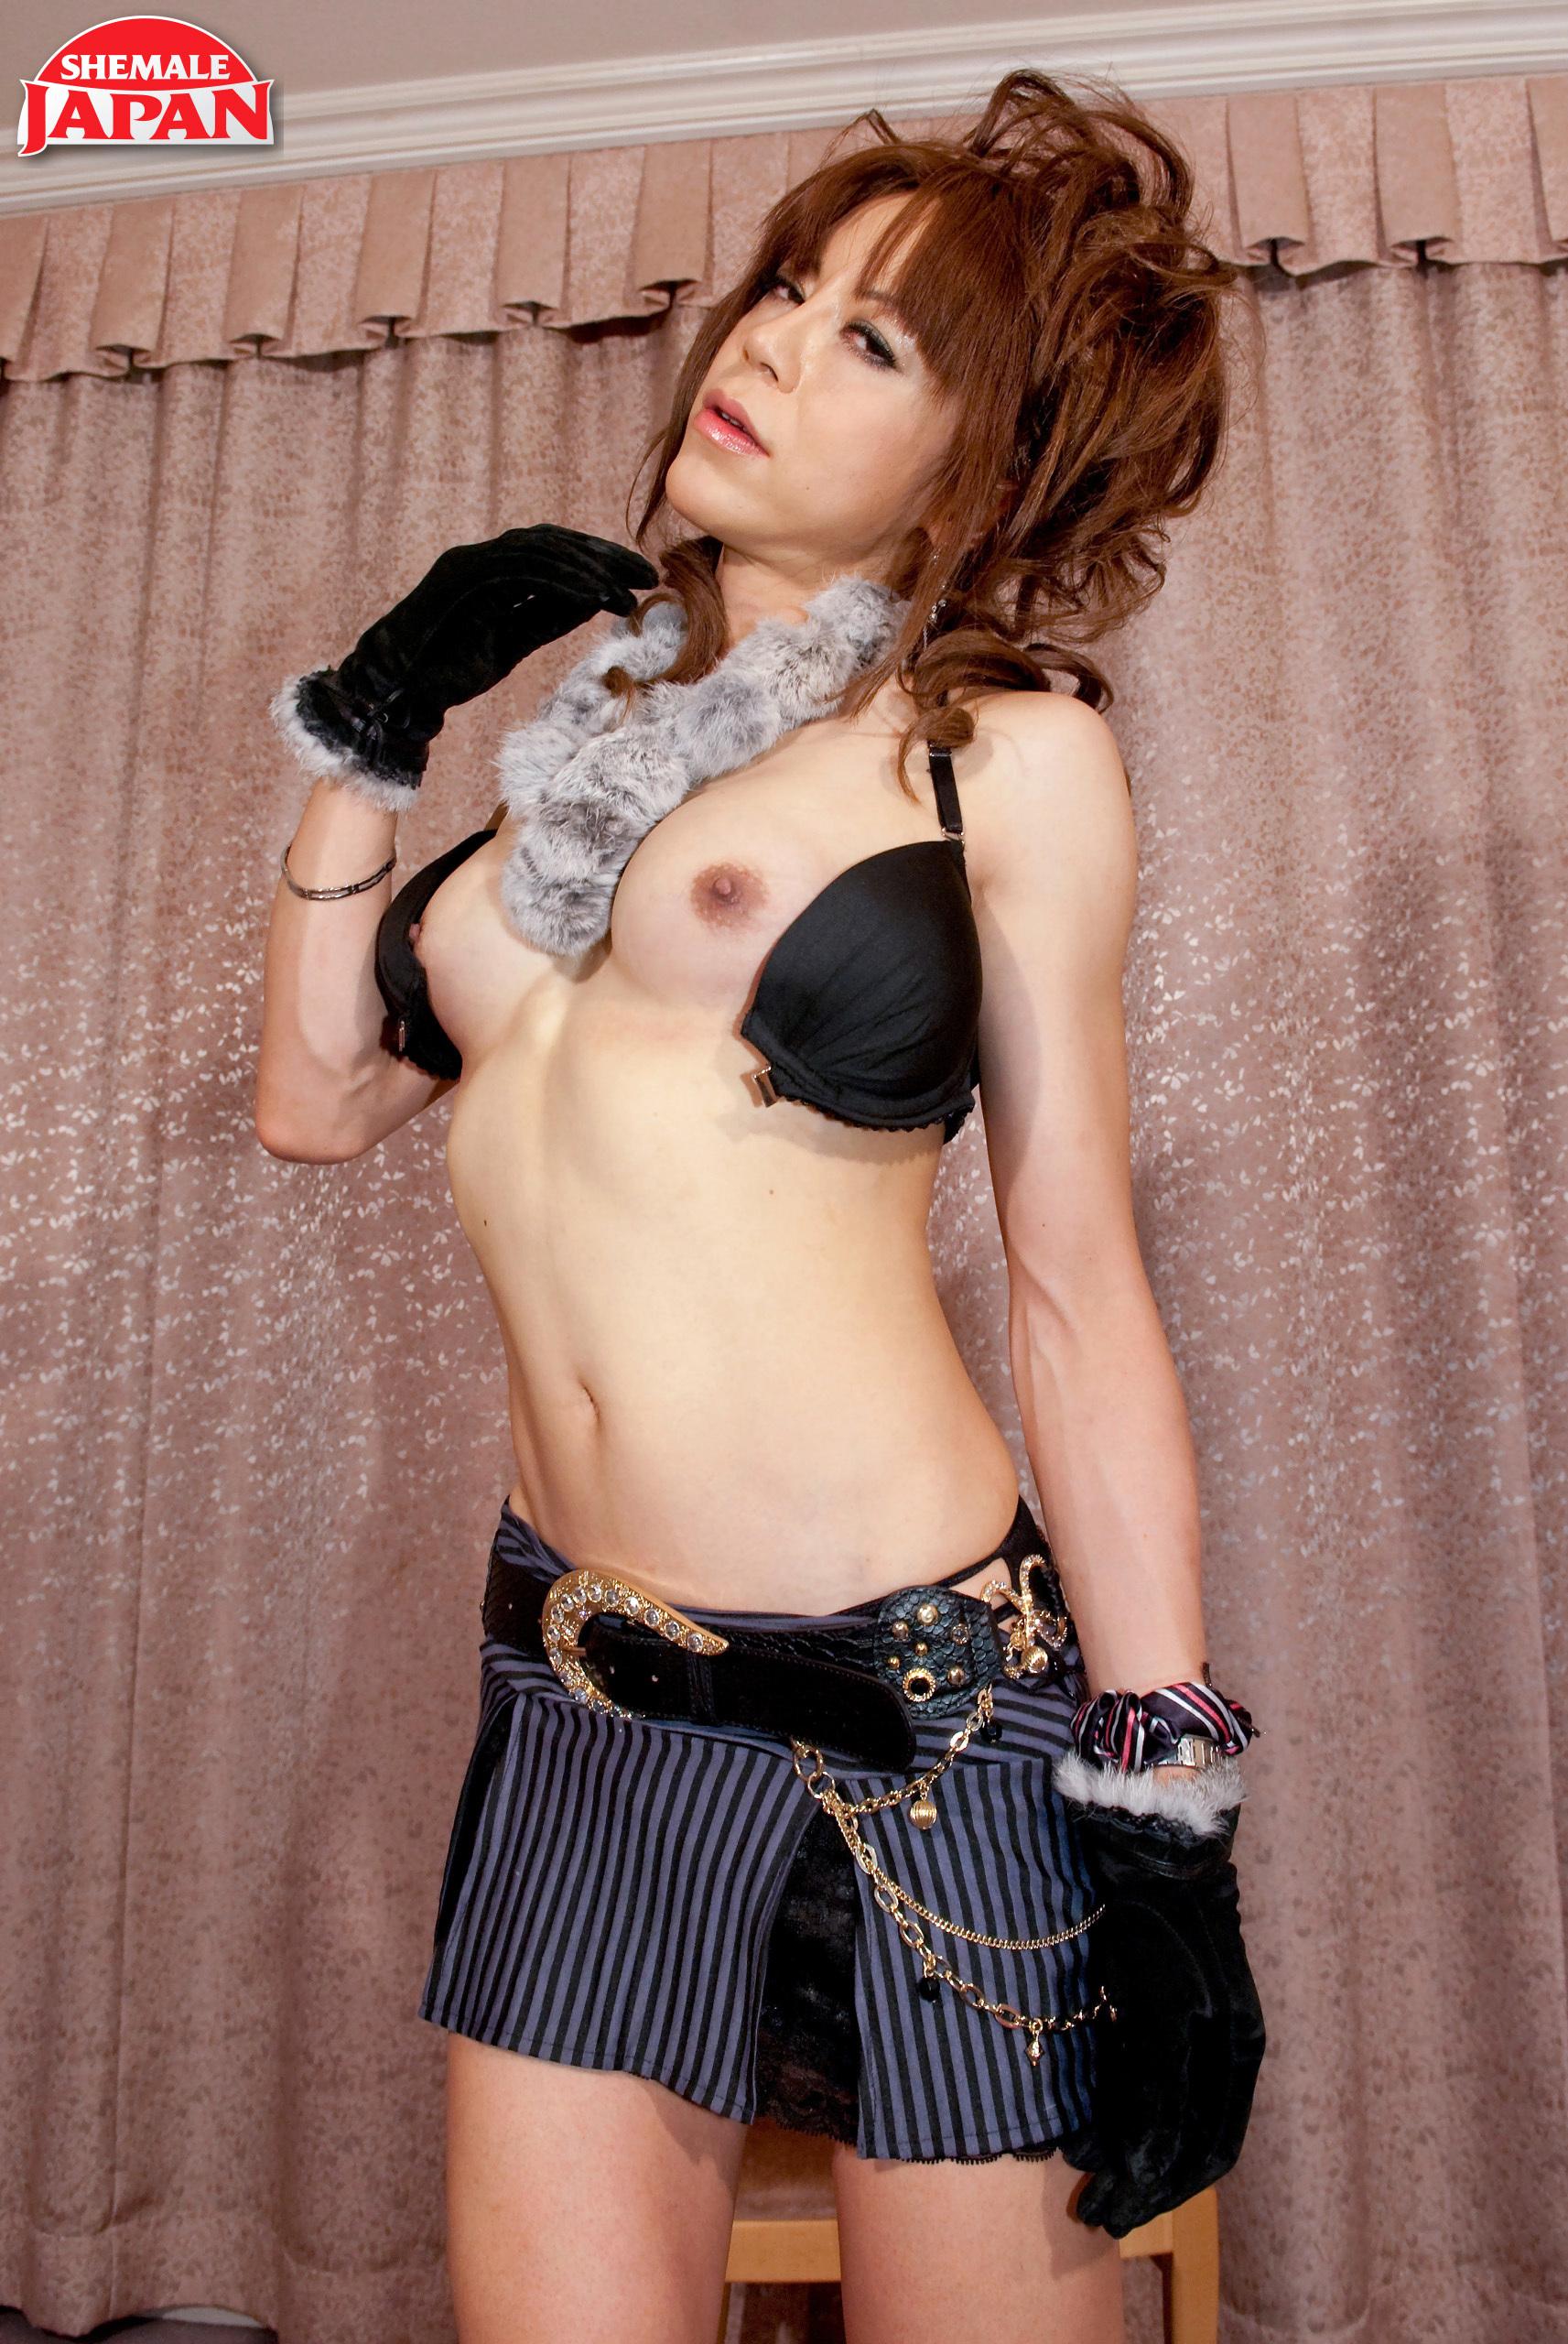 Sensual Seira Mikami!